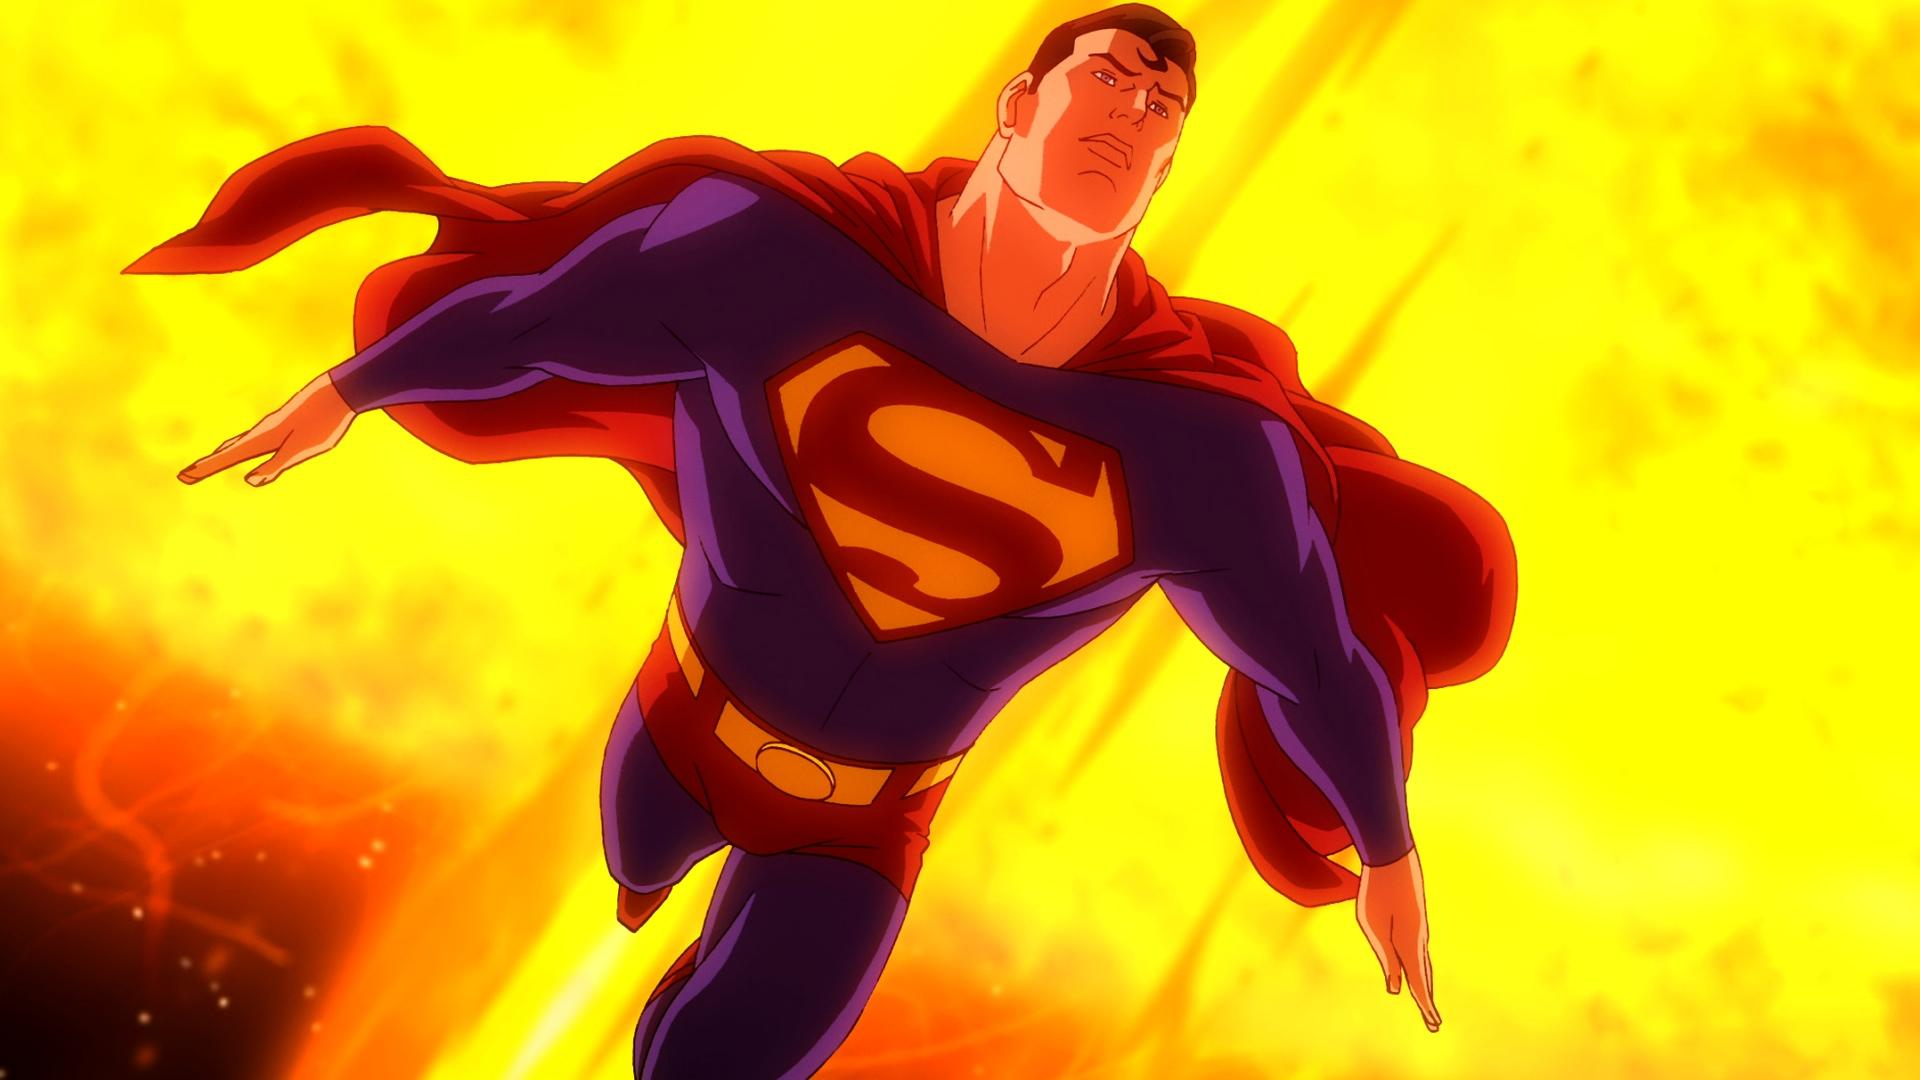 Superman HD Wallpaper for Desktop (18)